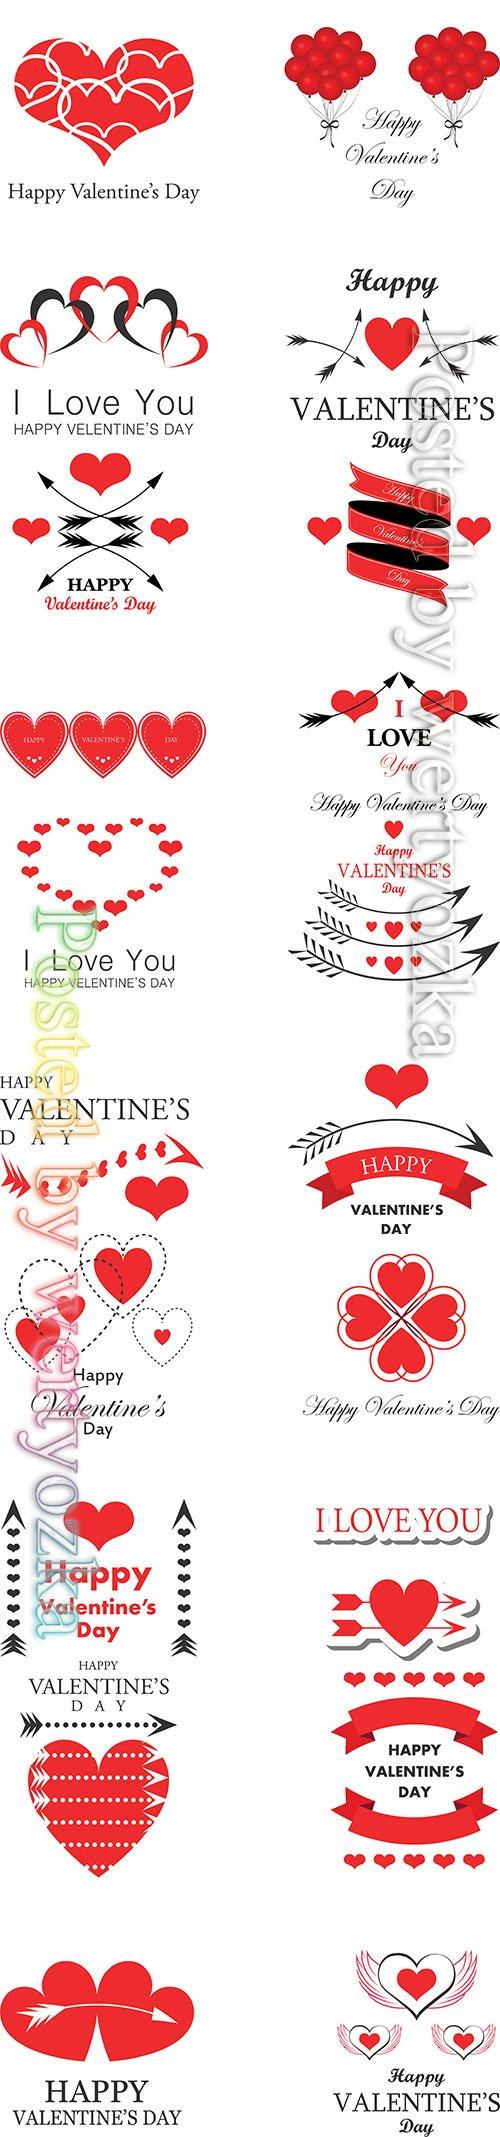 Wedding and Happy Valentine's Day logo